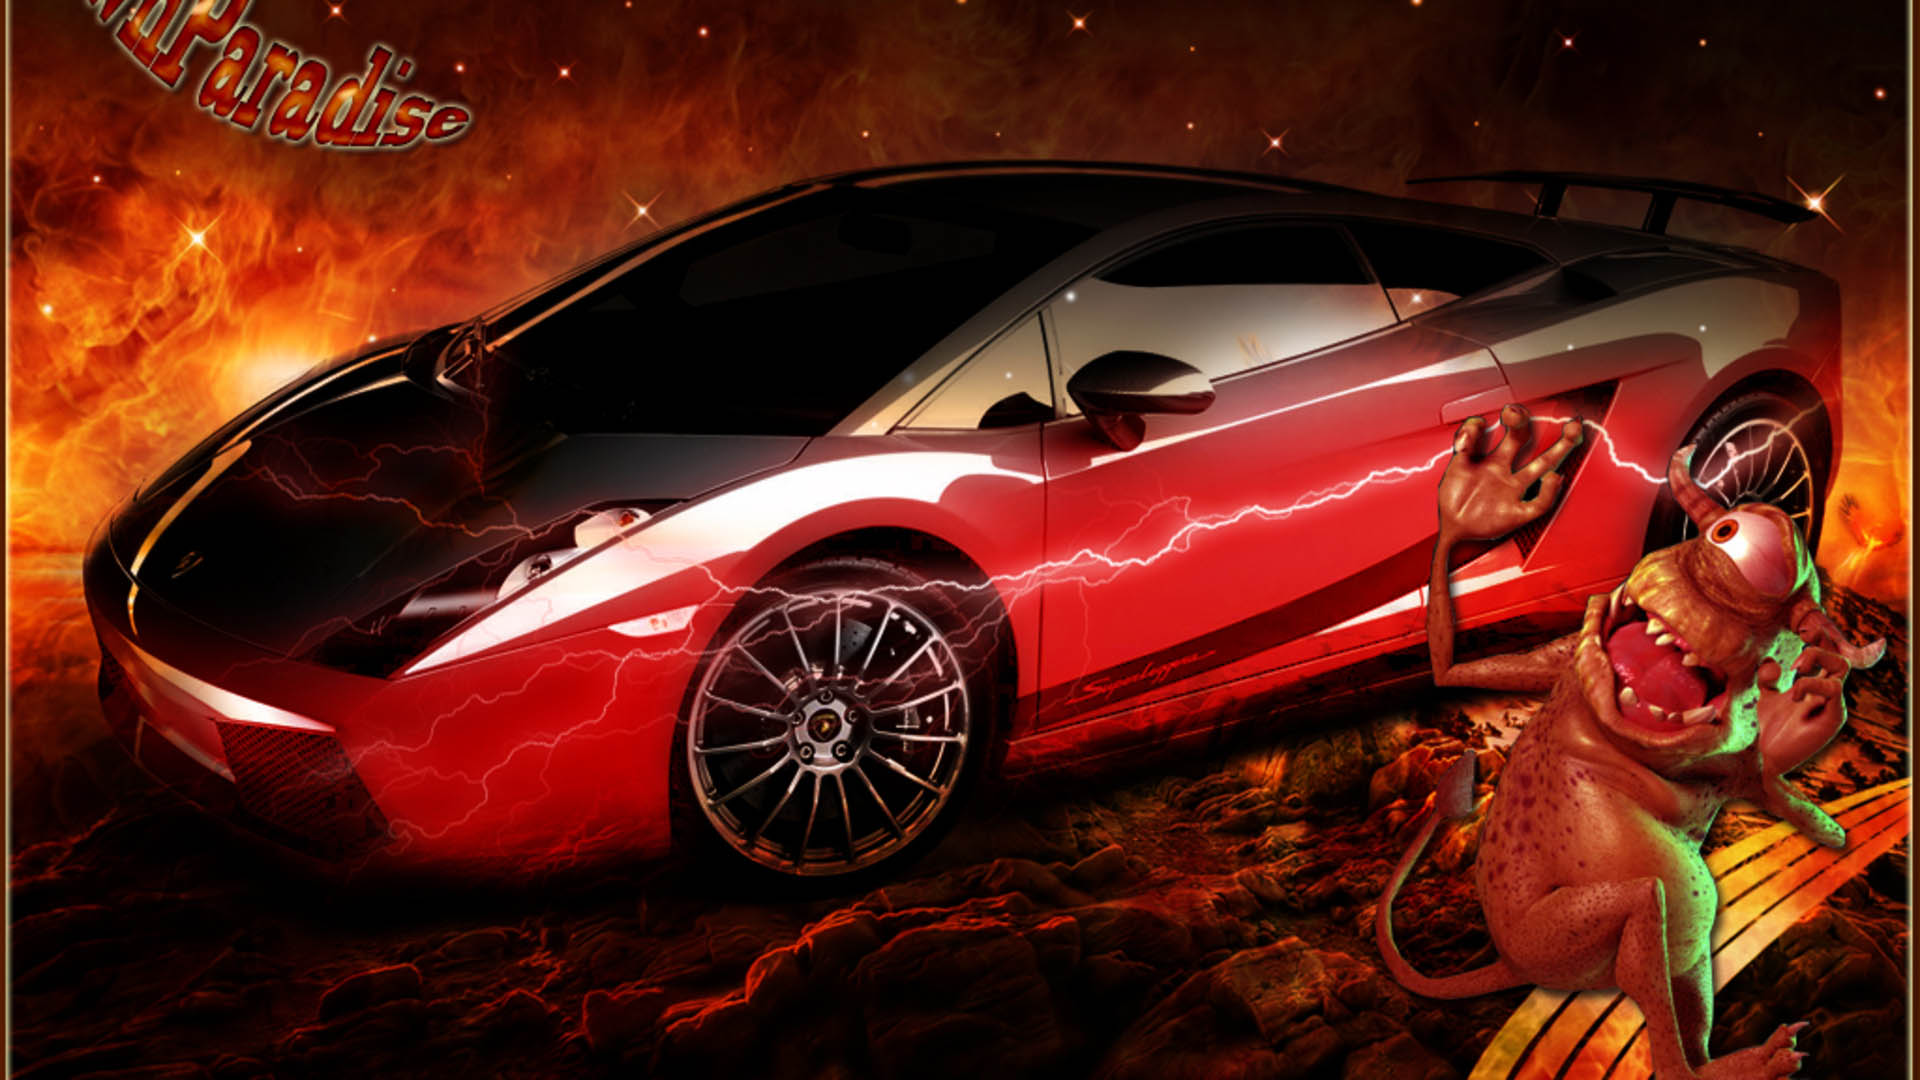 Click here to download in HD Format ee Lamborghini Wallpaper